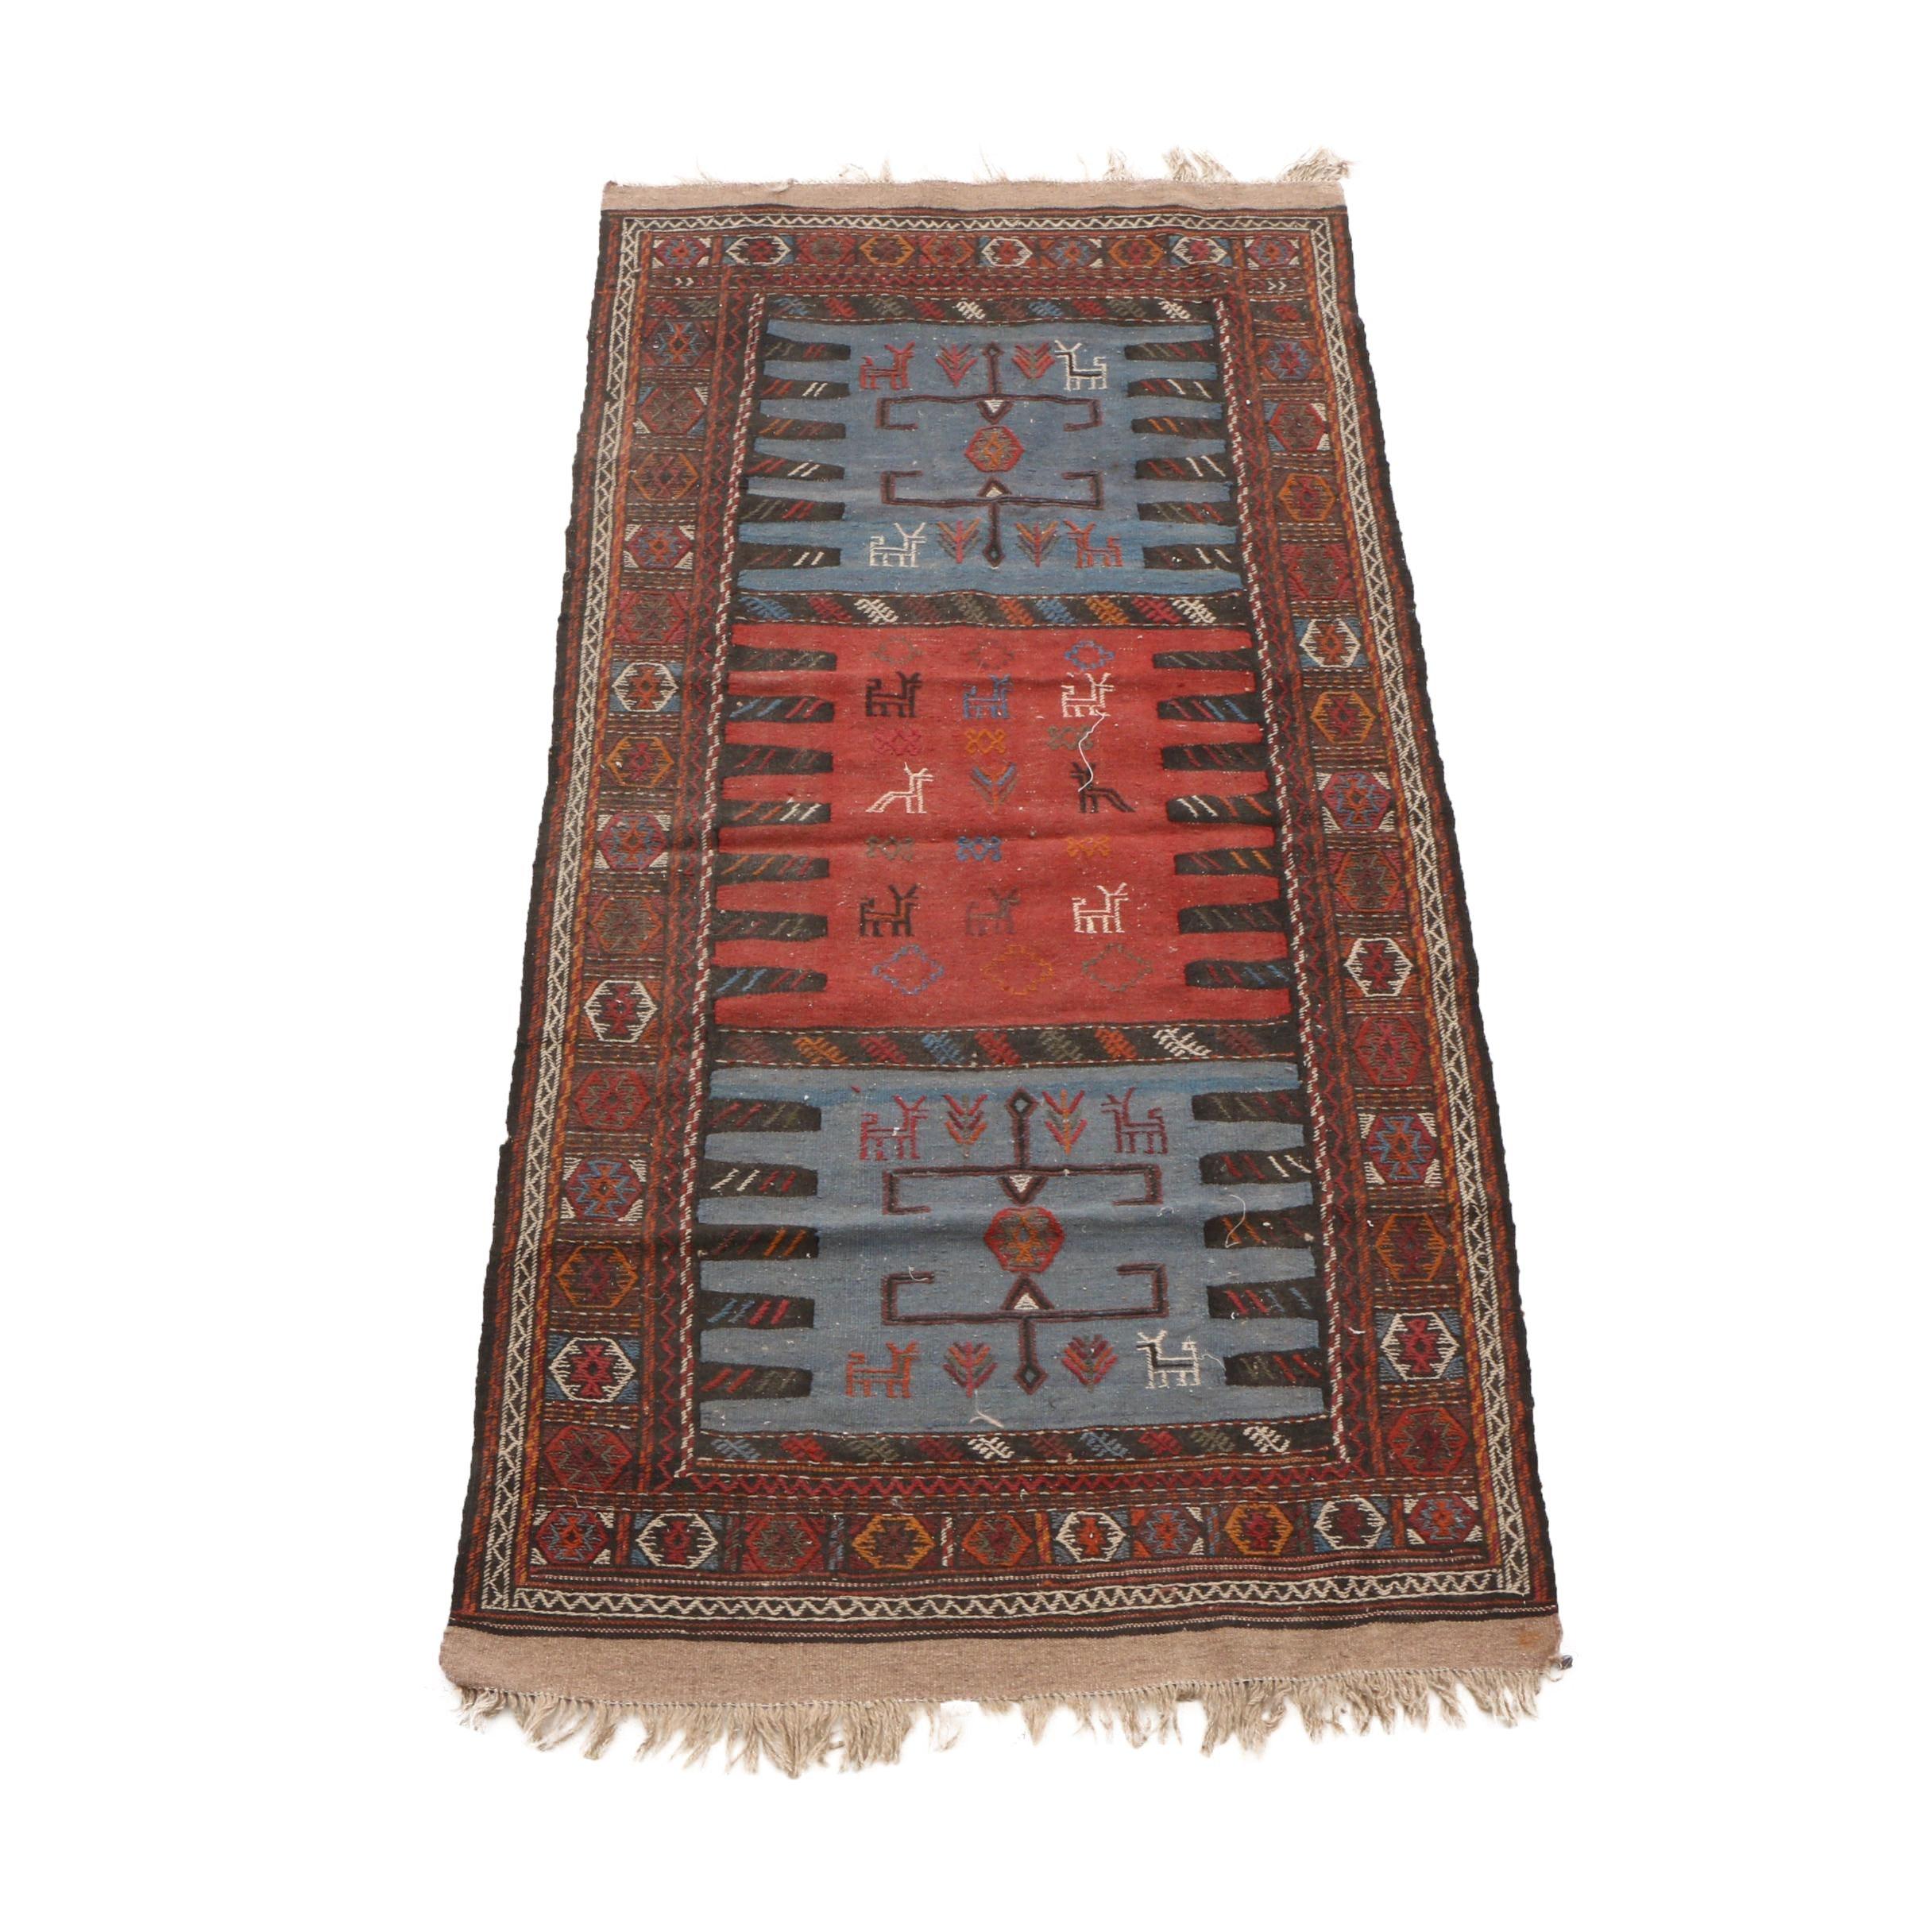 Handwoven and Brocade Turkish Wool Rug